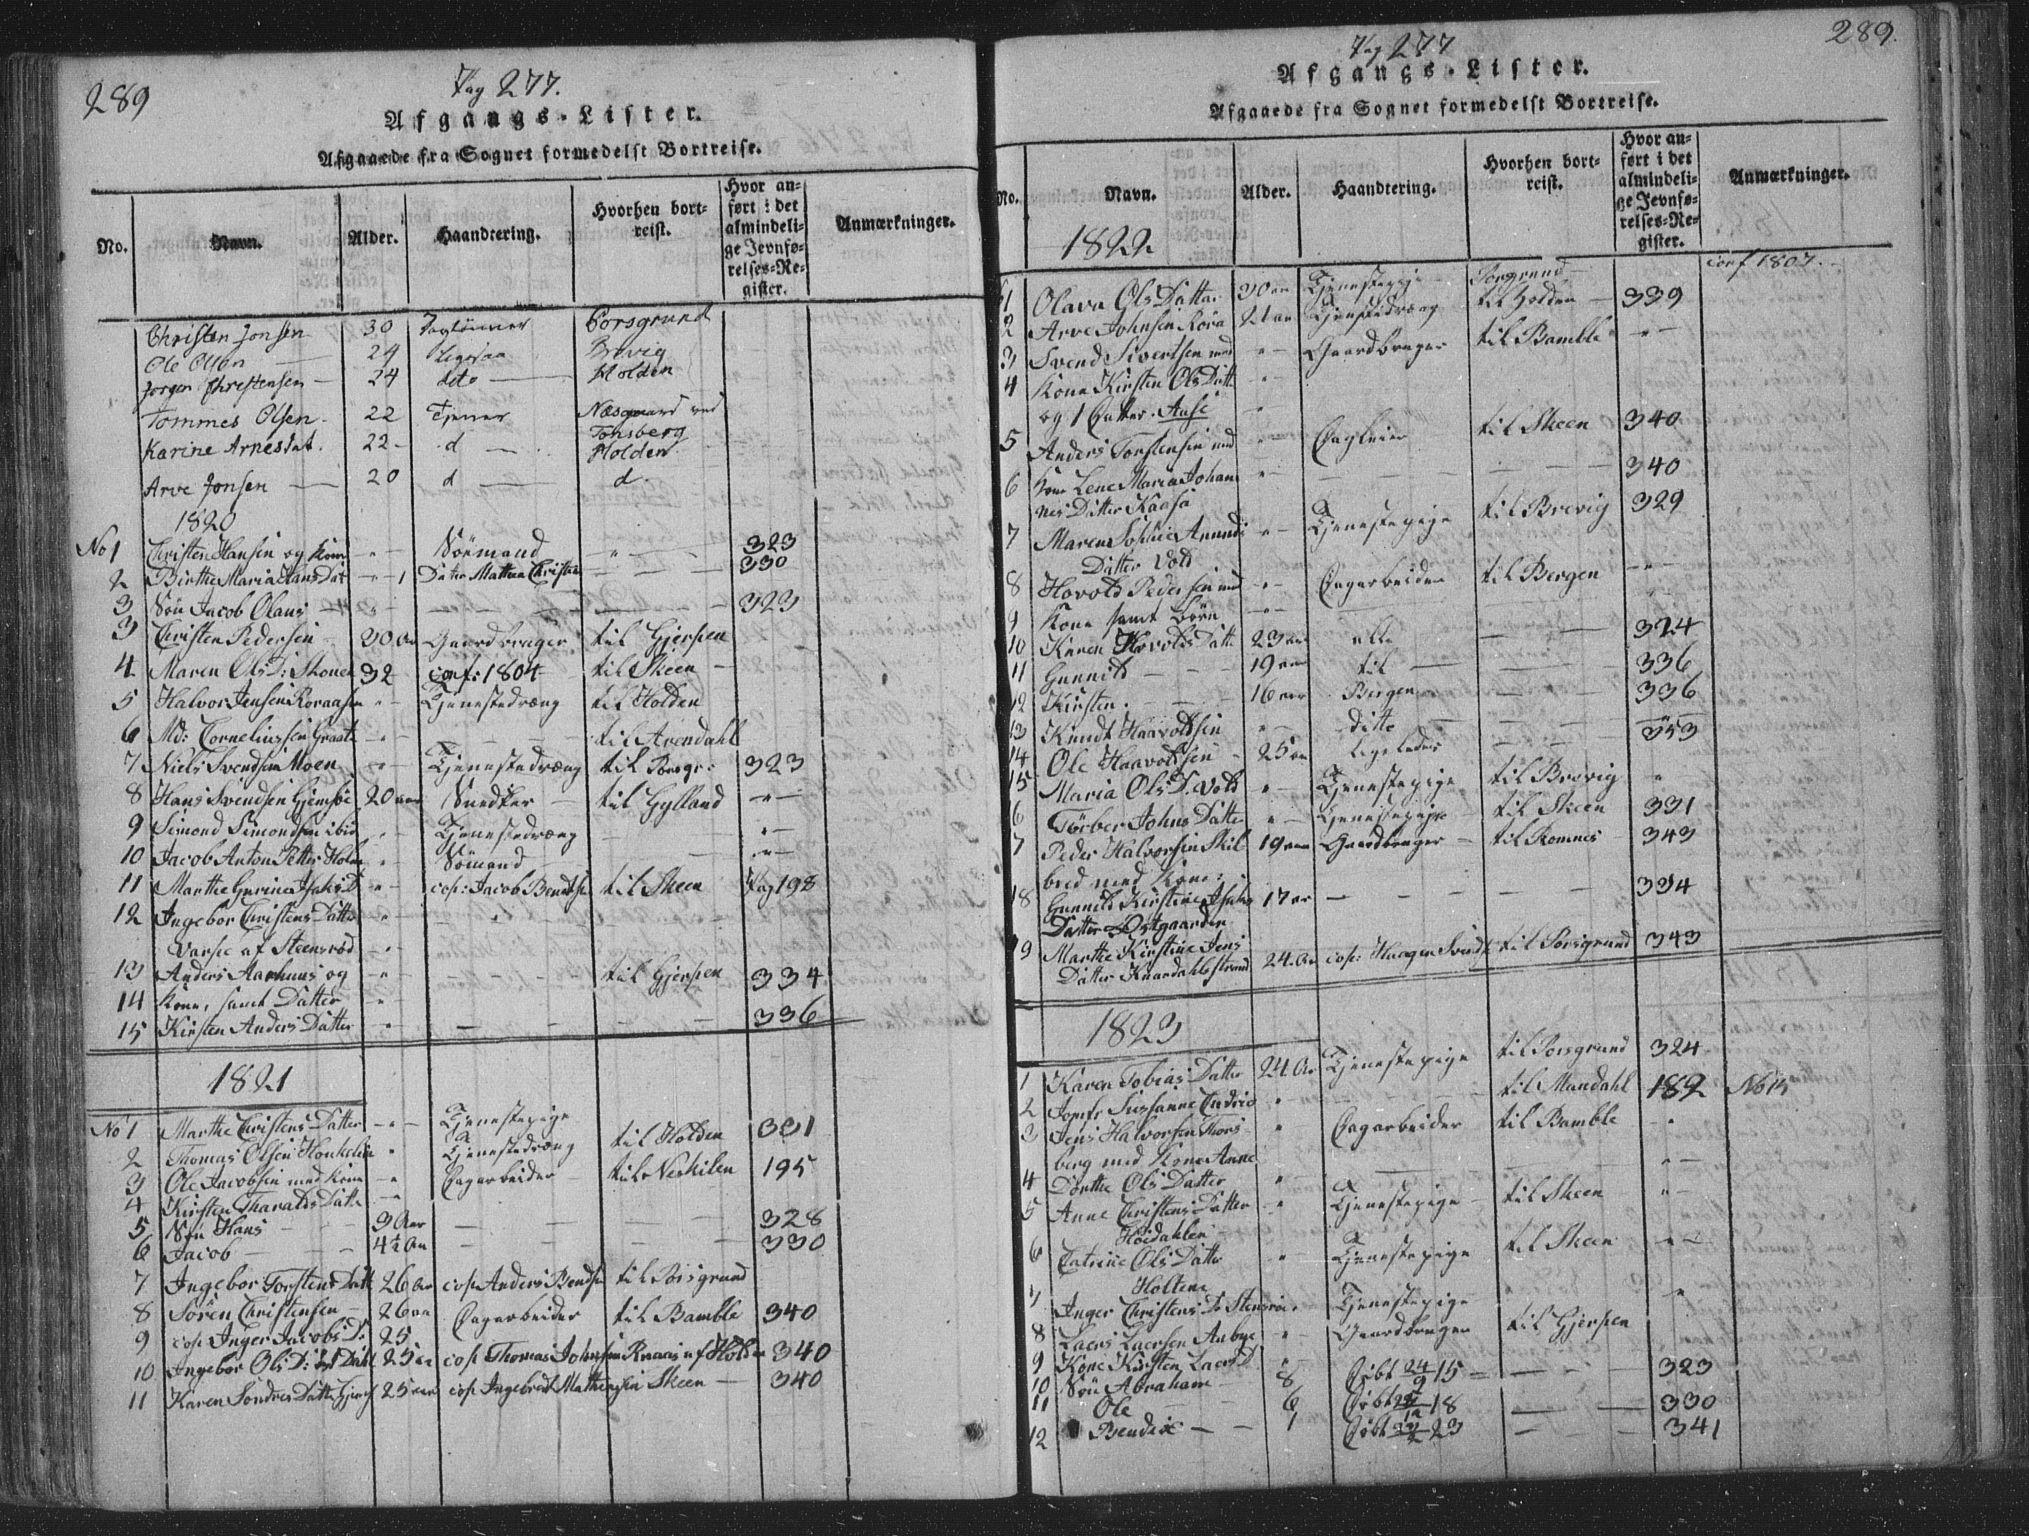 SAKO, Solum kirkebøker, F/Fa/L0004: Ministerialbok nr. I 4, 1814-1833, s. 289